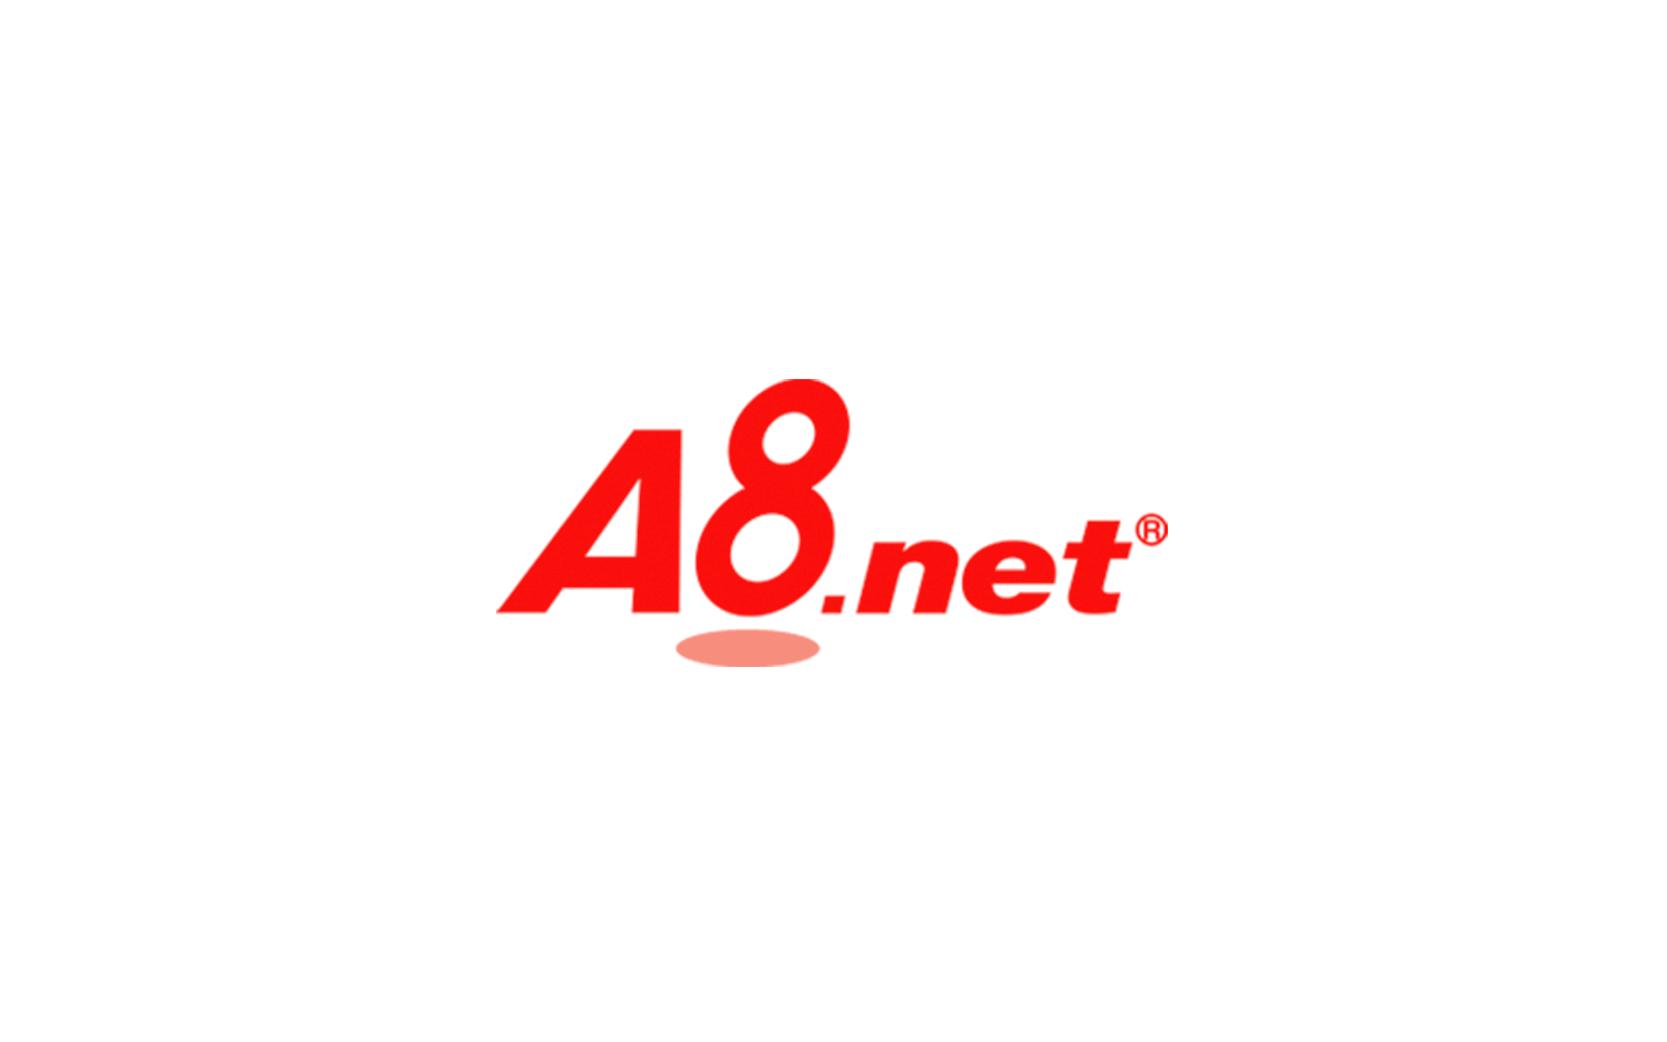 「A8.net」で自己アフィリエイトができる案件は「セルフバック」か「本人OK」のもの